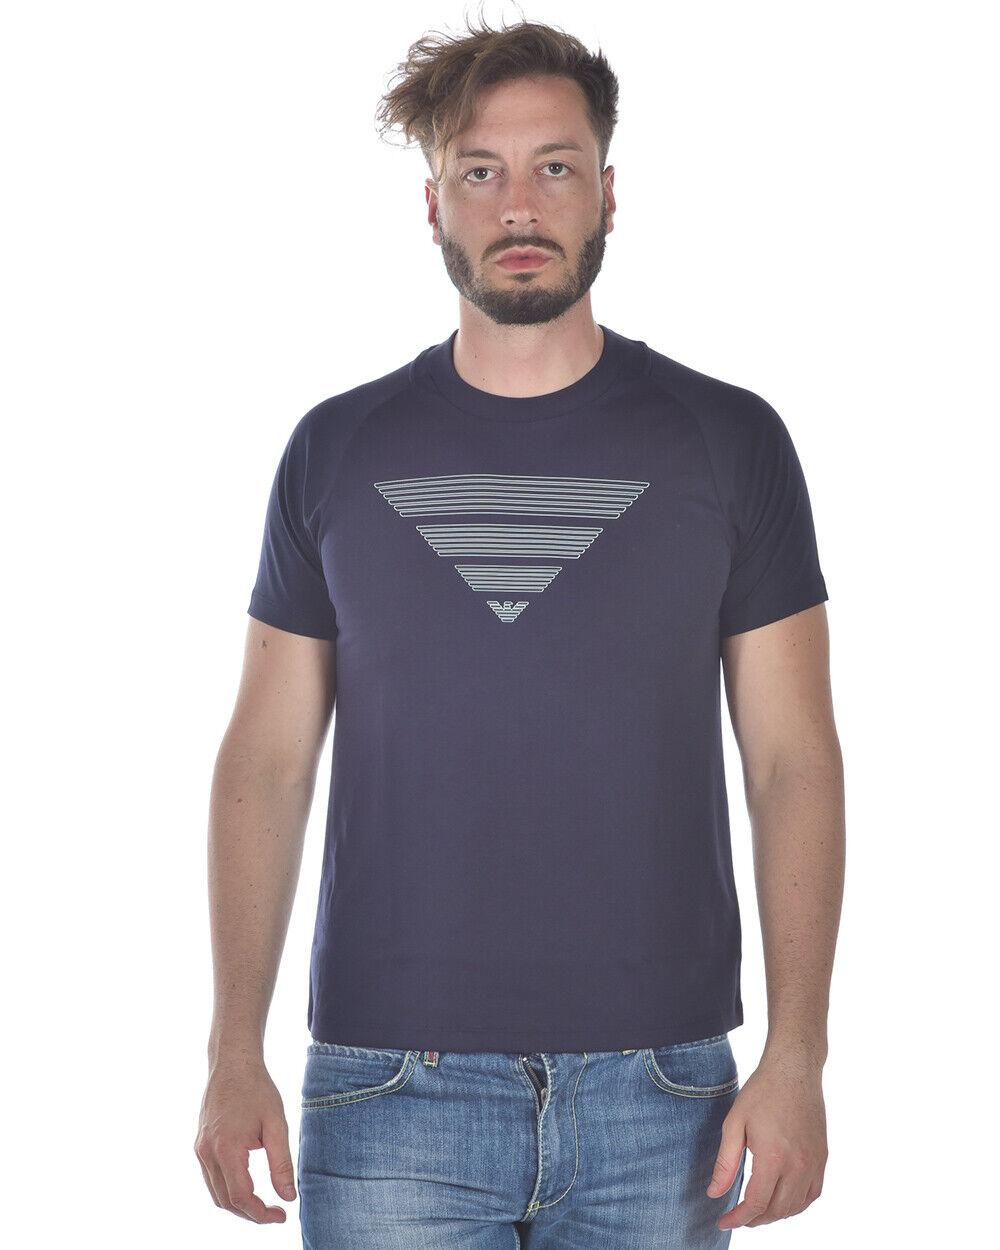 Emporio Armani T hemd schweißhemd Man Blau 3Z1T711JPRZ 922 Sz M MAKE OFFER